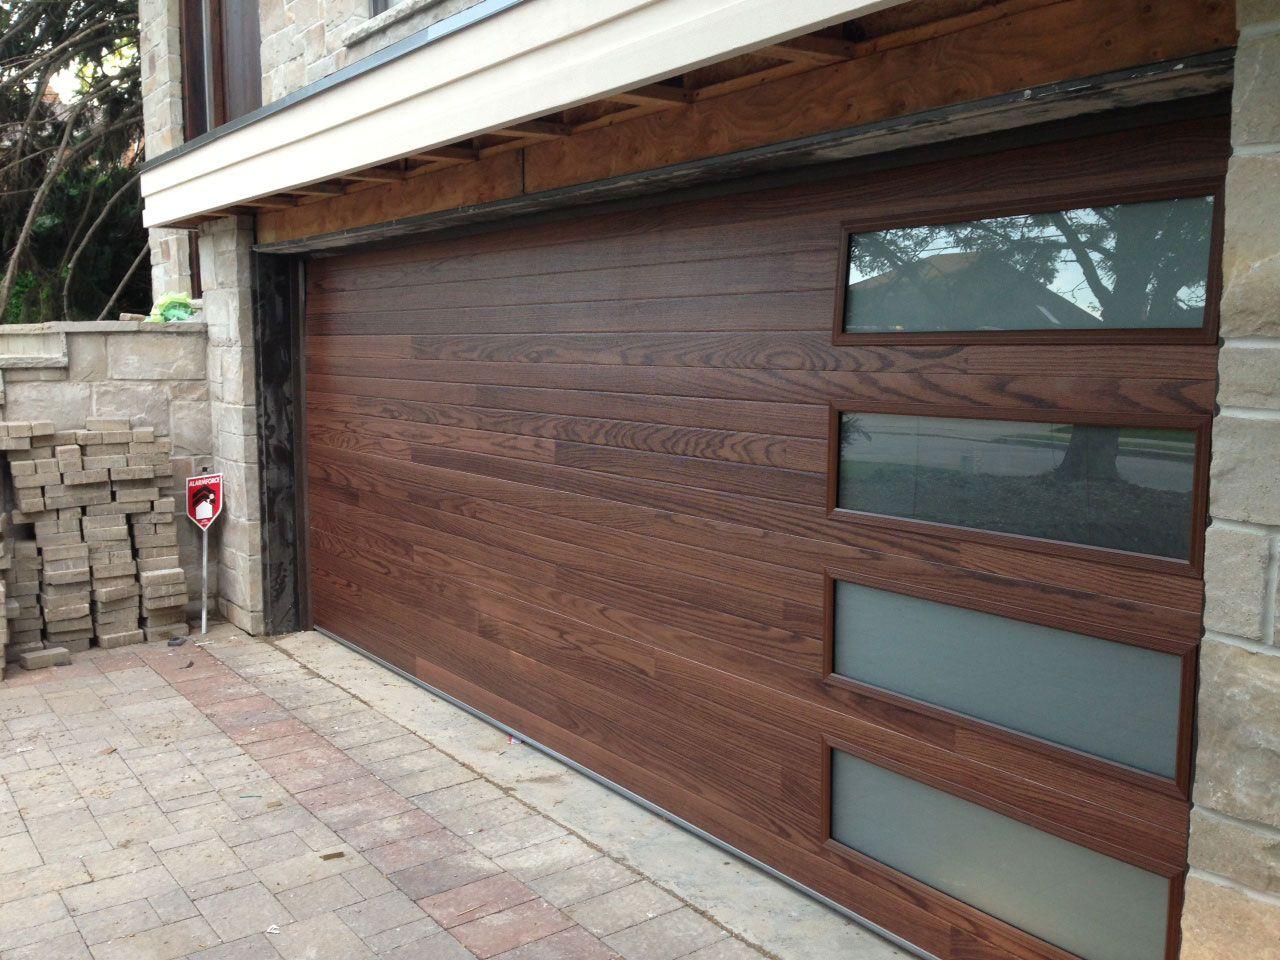 Unique Minimalist Modern Garage Doors Design With Wooden Material